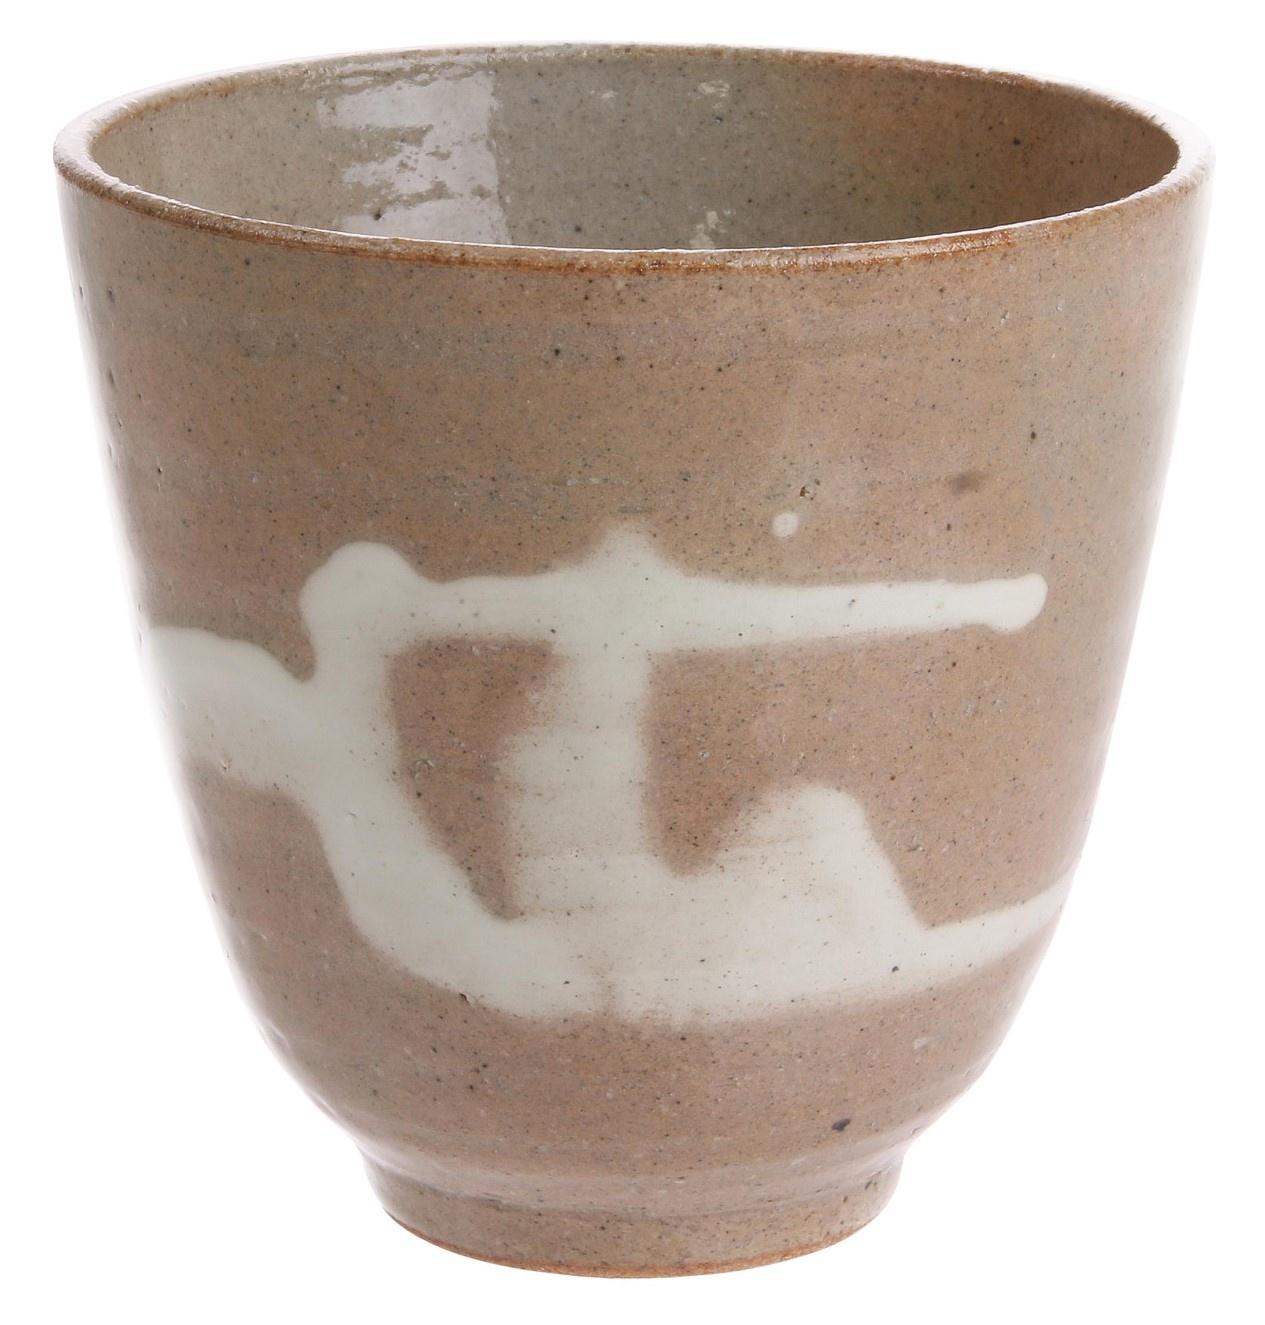 Mok kyoto ceramics: japanese yunomi mugs light pink-1